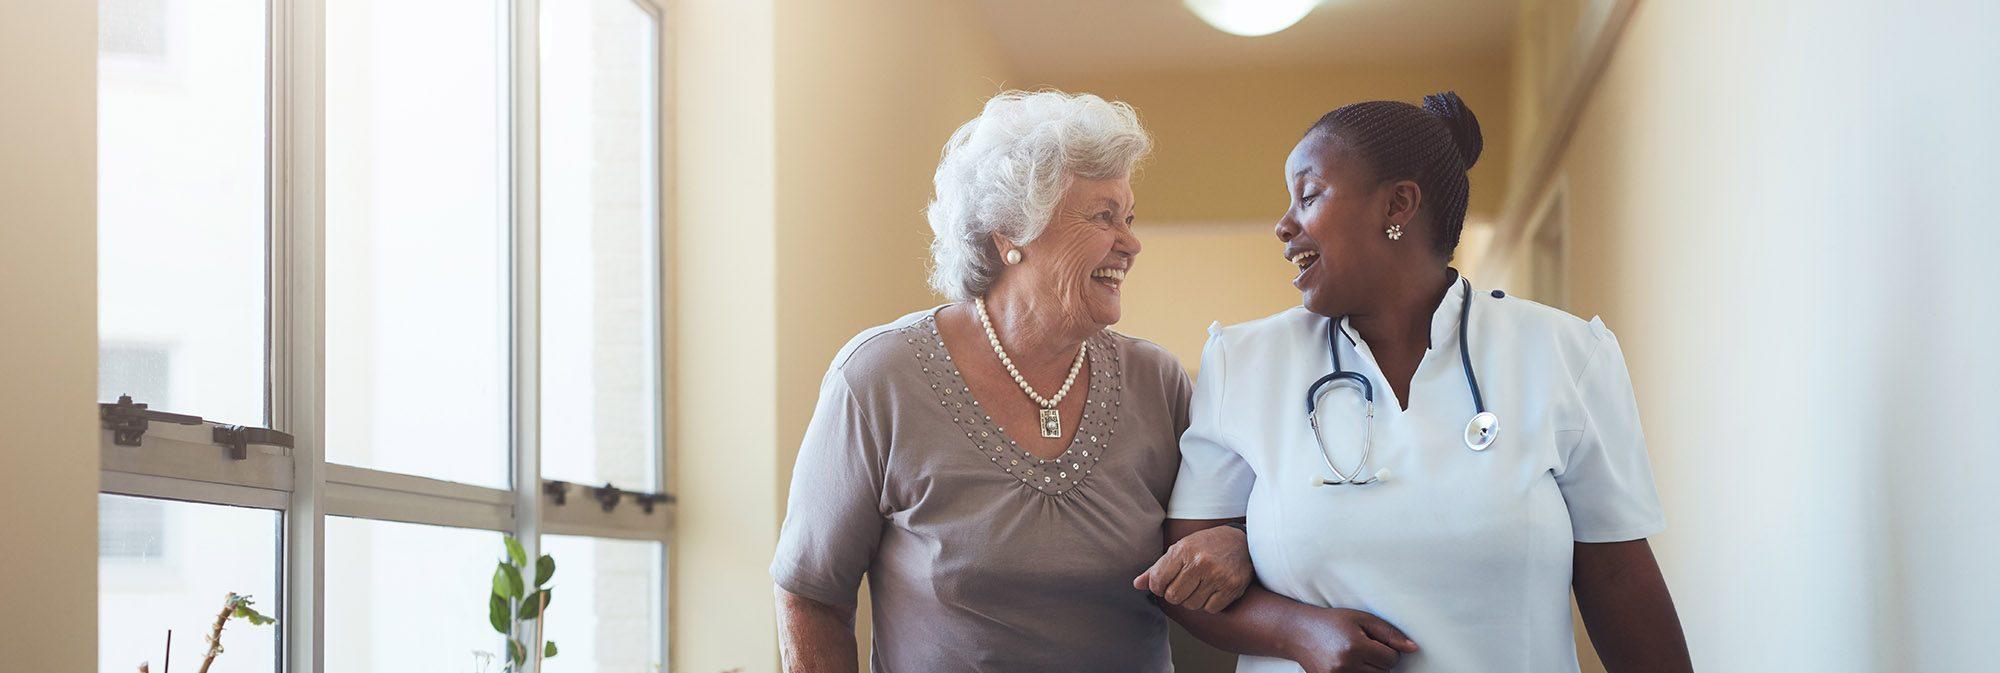 nurse walking down a hallway with an elderly patient